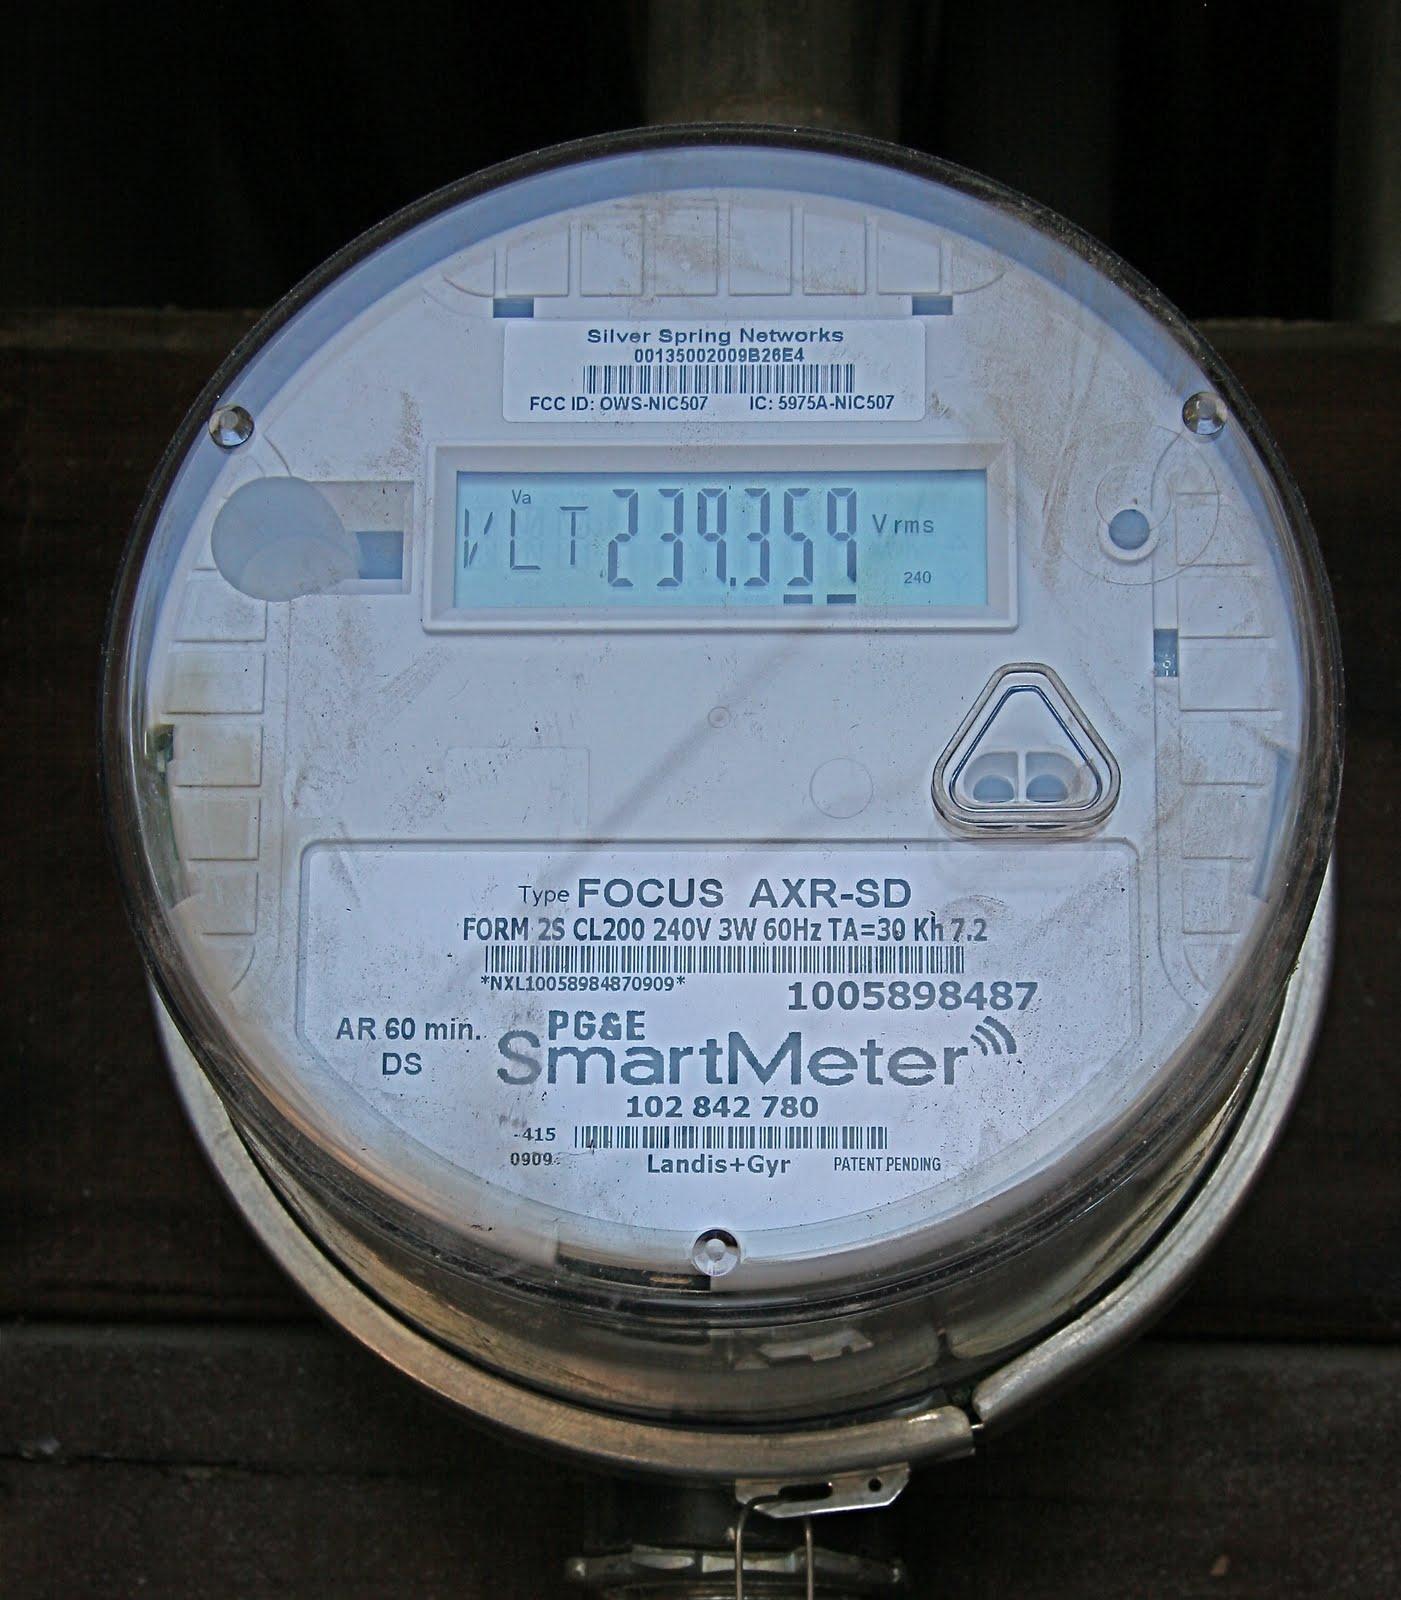 Smart Meter Vs Analog Meter : Deborah tavares talks about your rights regarding smart